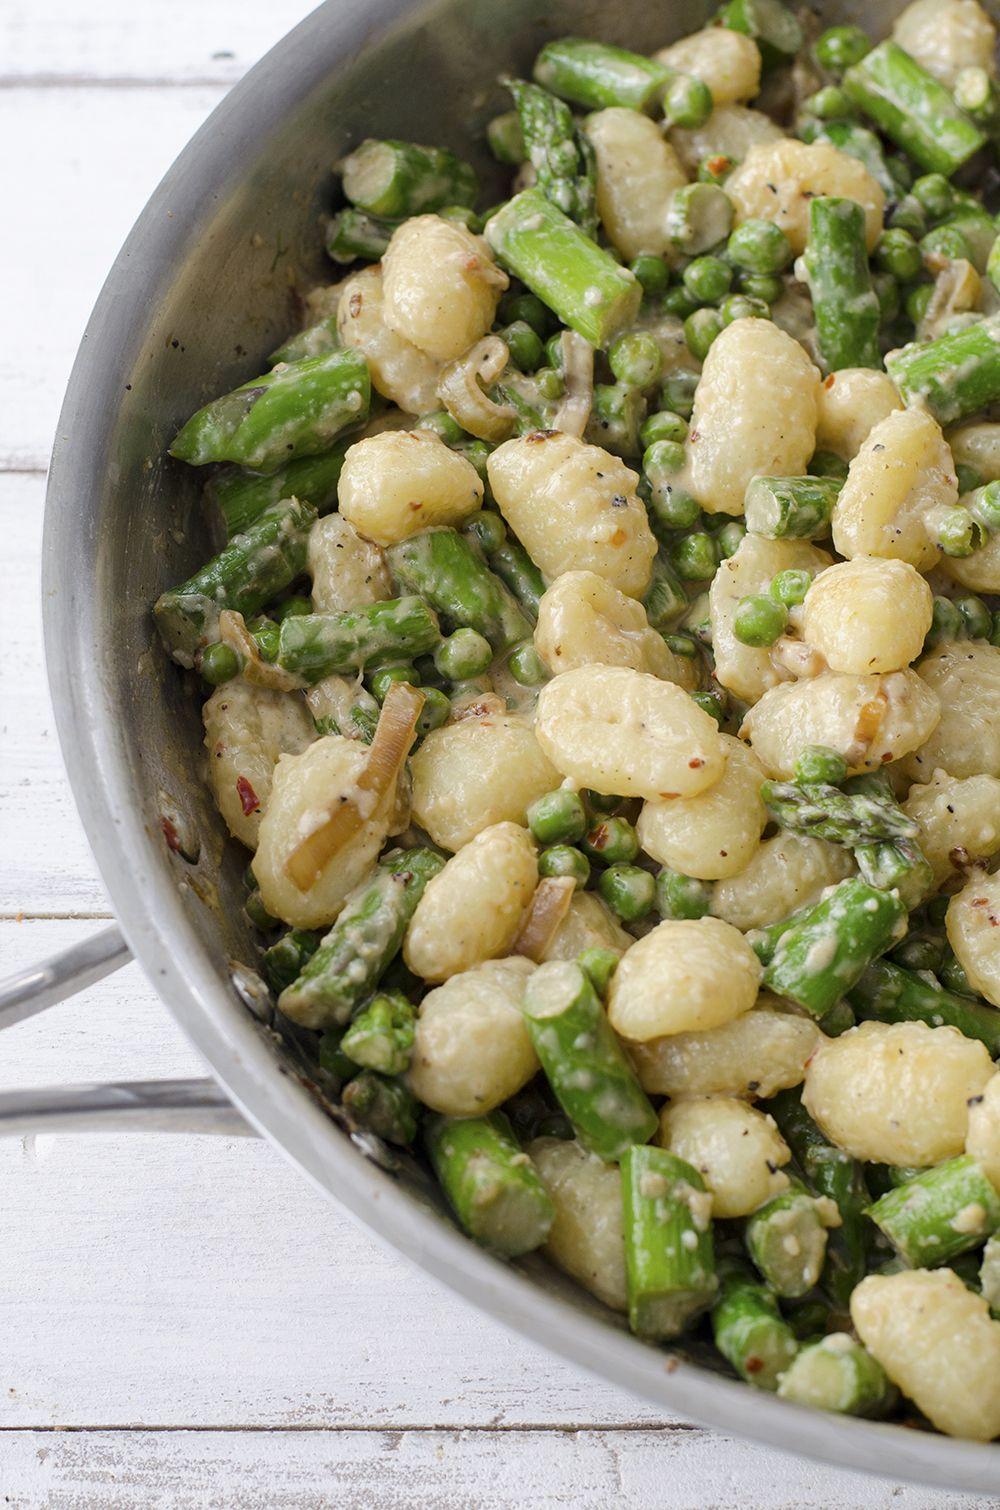 Spring Vegetable Gnocchi // gnocchi, shallots, asparagus, spring peas, parmesan cheese, heavy cream